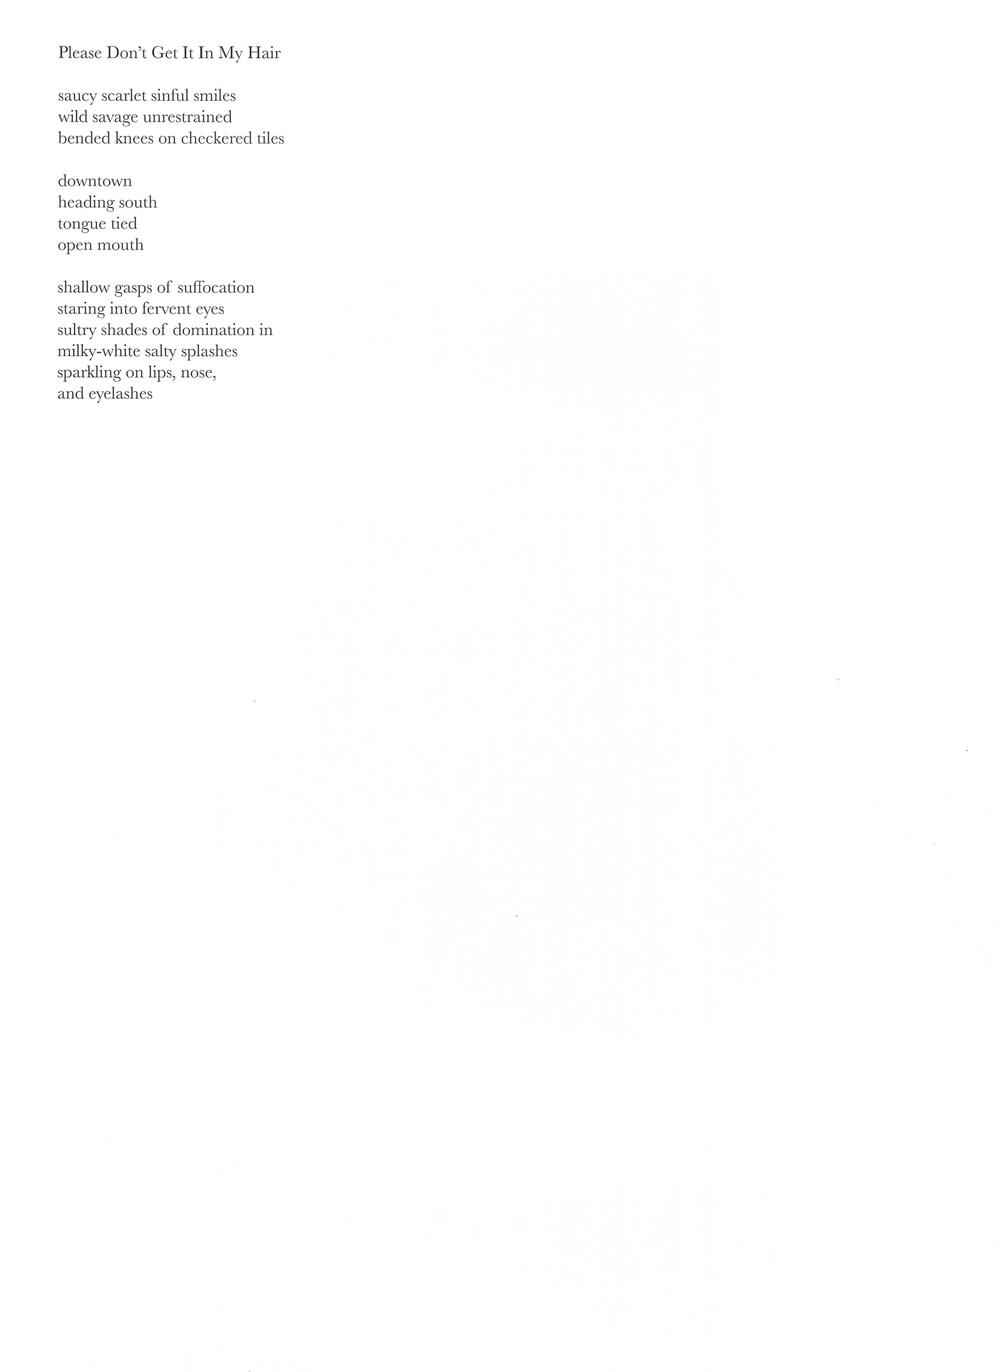 Signatures2014-2015_final-51 copy.jpg